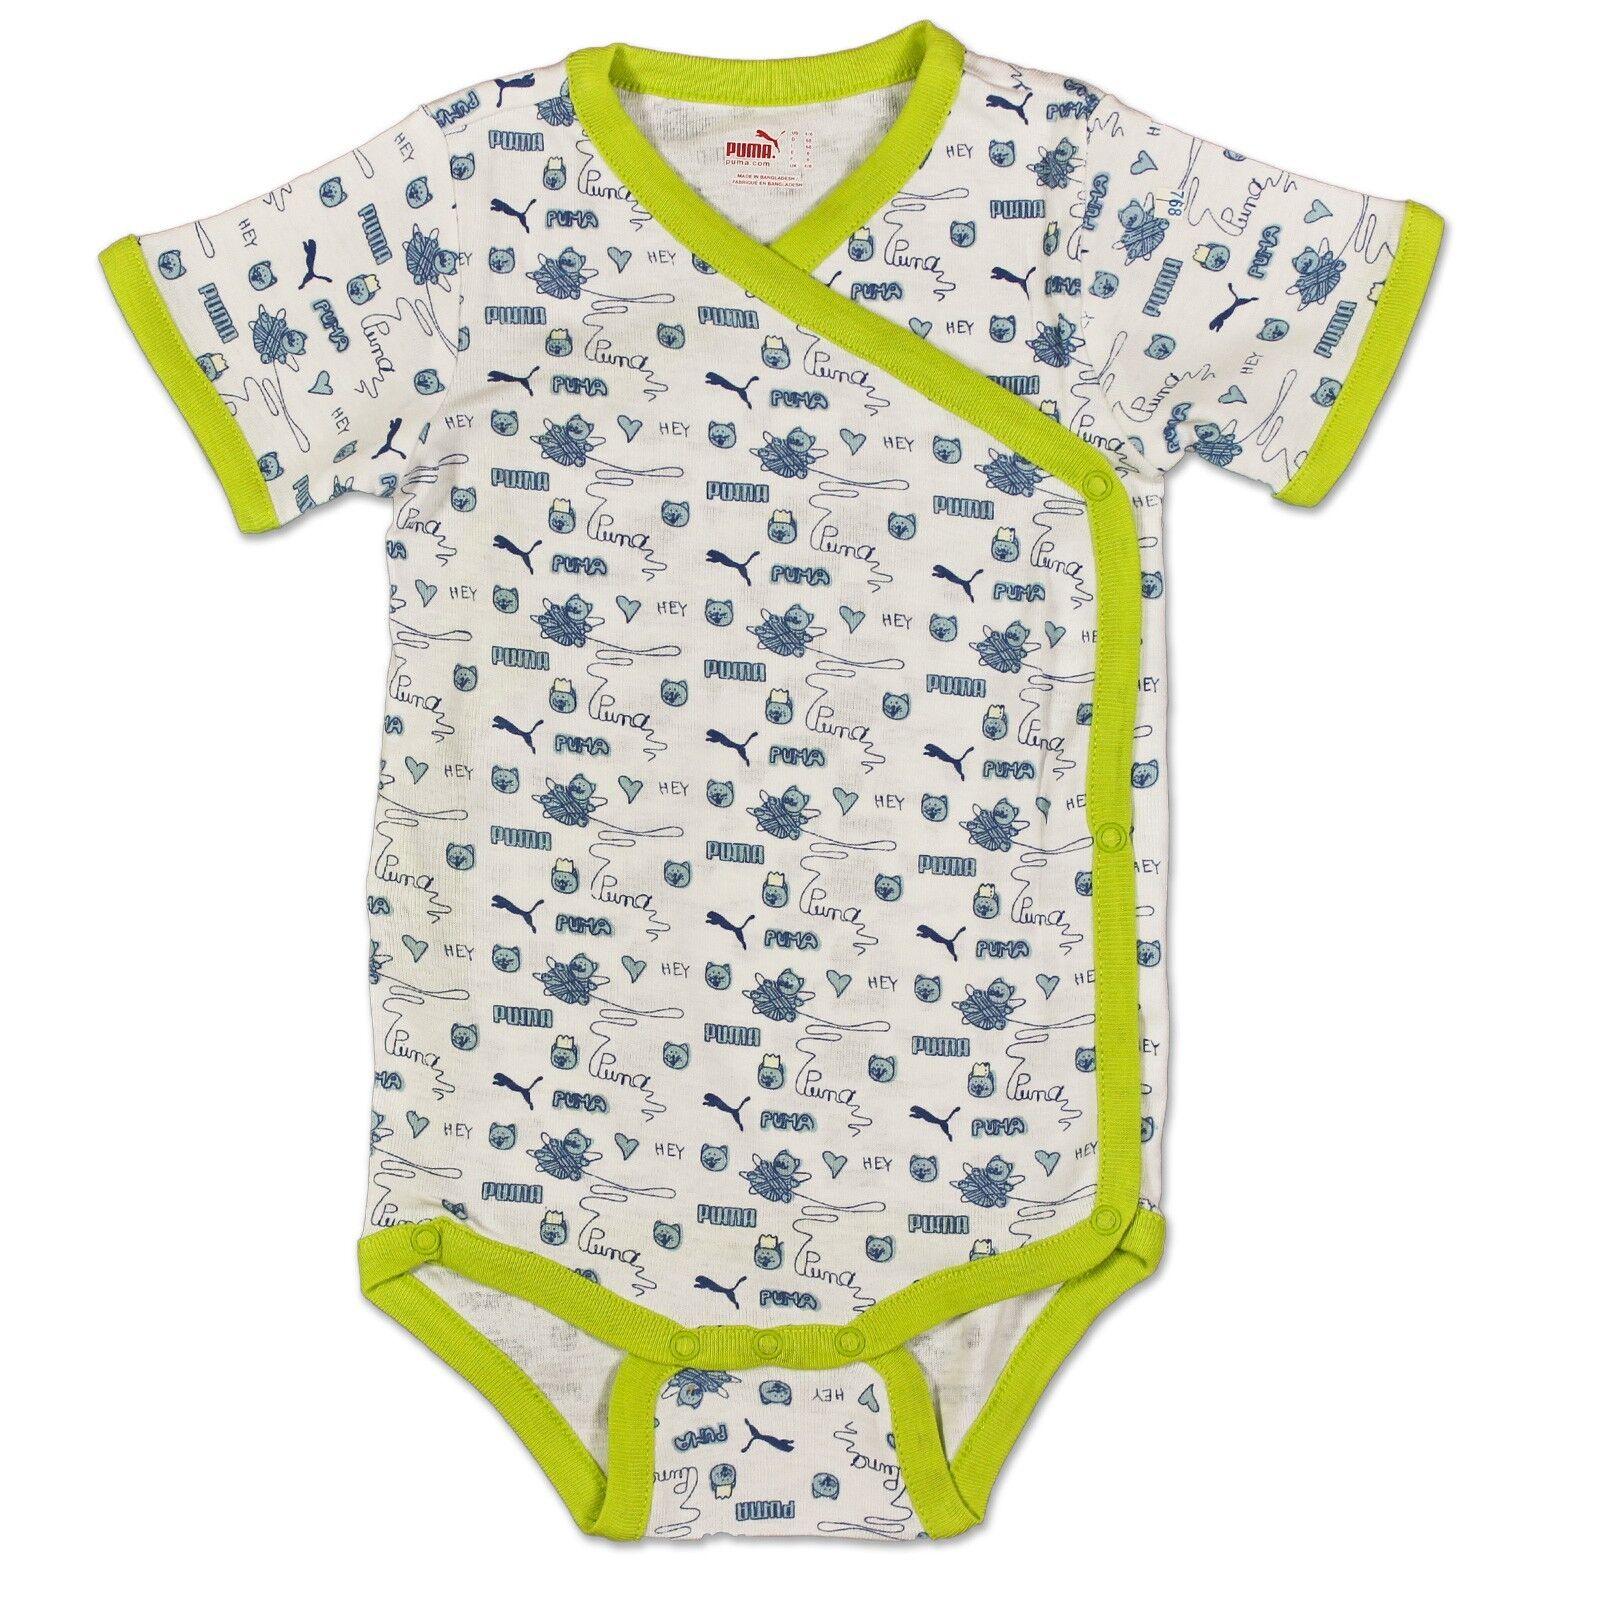 3ddb44239ecc PUMA Baby Romper Set Bodysuit Body Suit Scarf Bag White Green 68